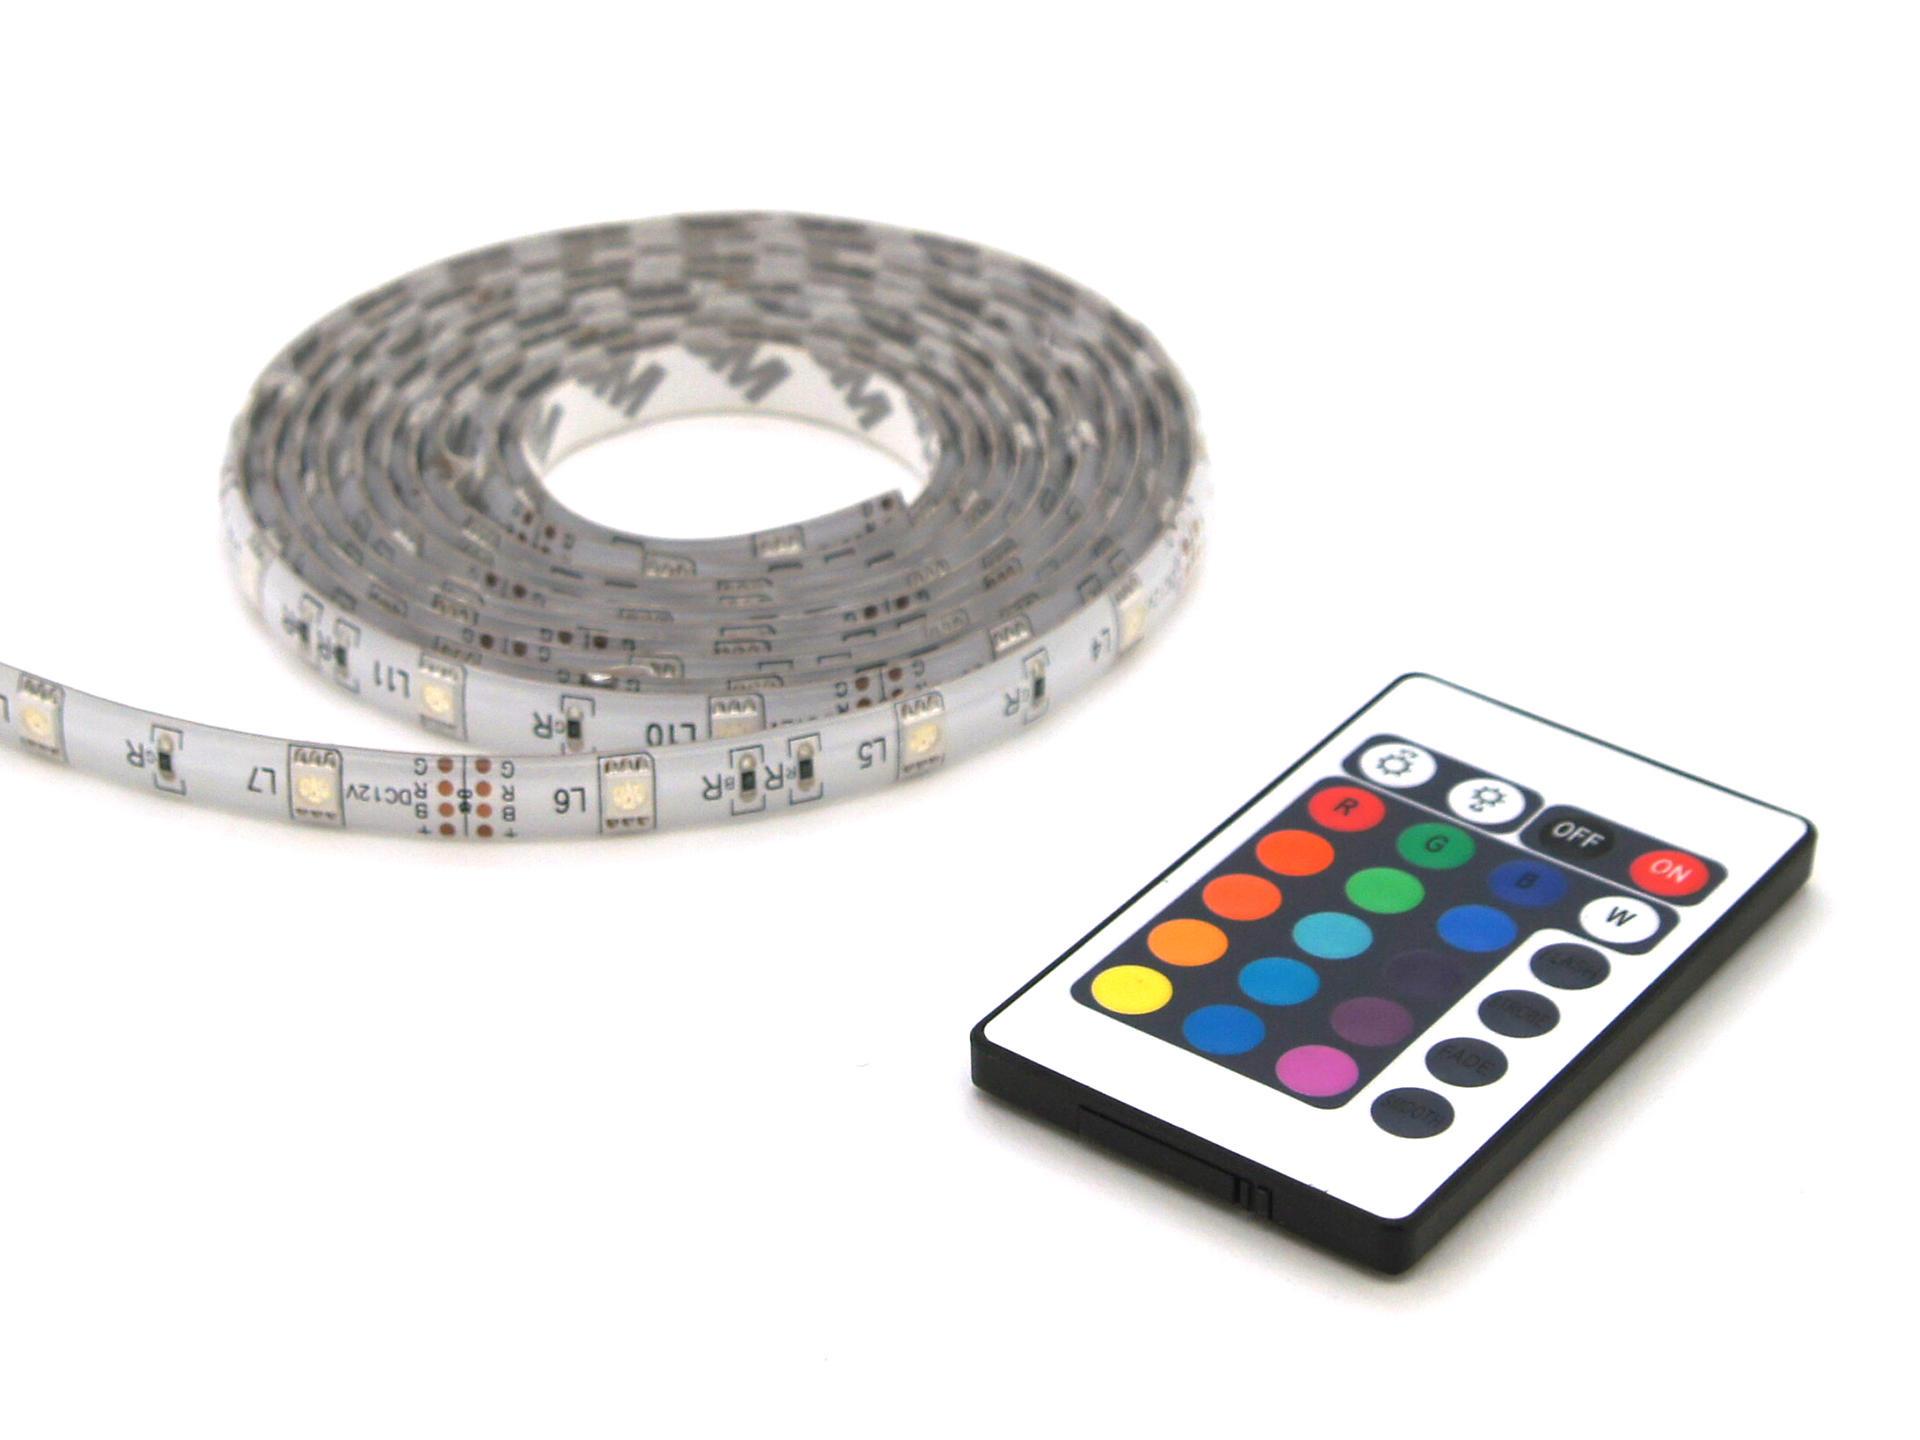 Ruban-LED-RGB-2m-avec-telecommande-IP44_427020_1920x1440